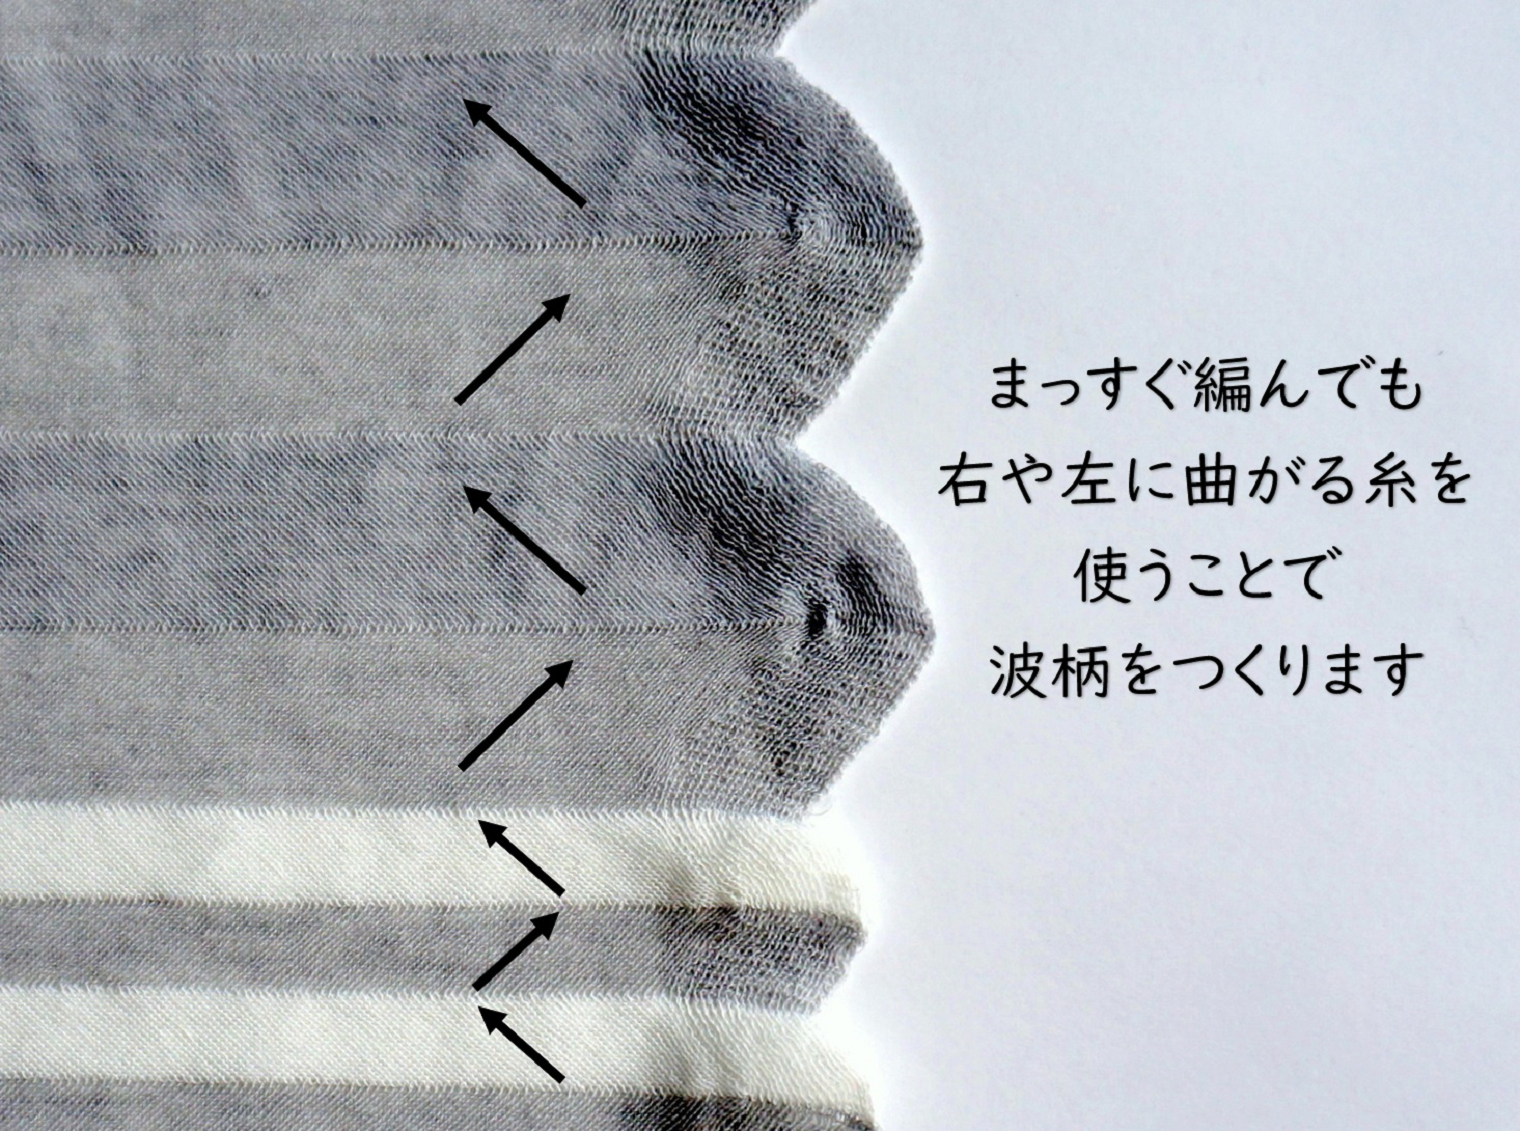 nico ストールポンチョ 波と縞 コットン100% 編み地の説明